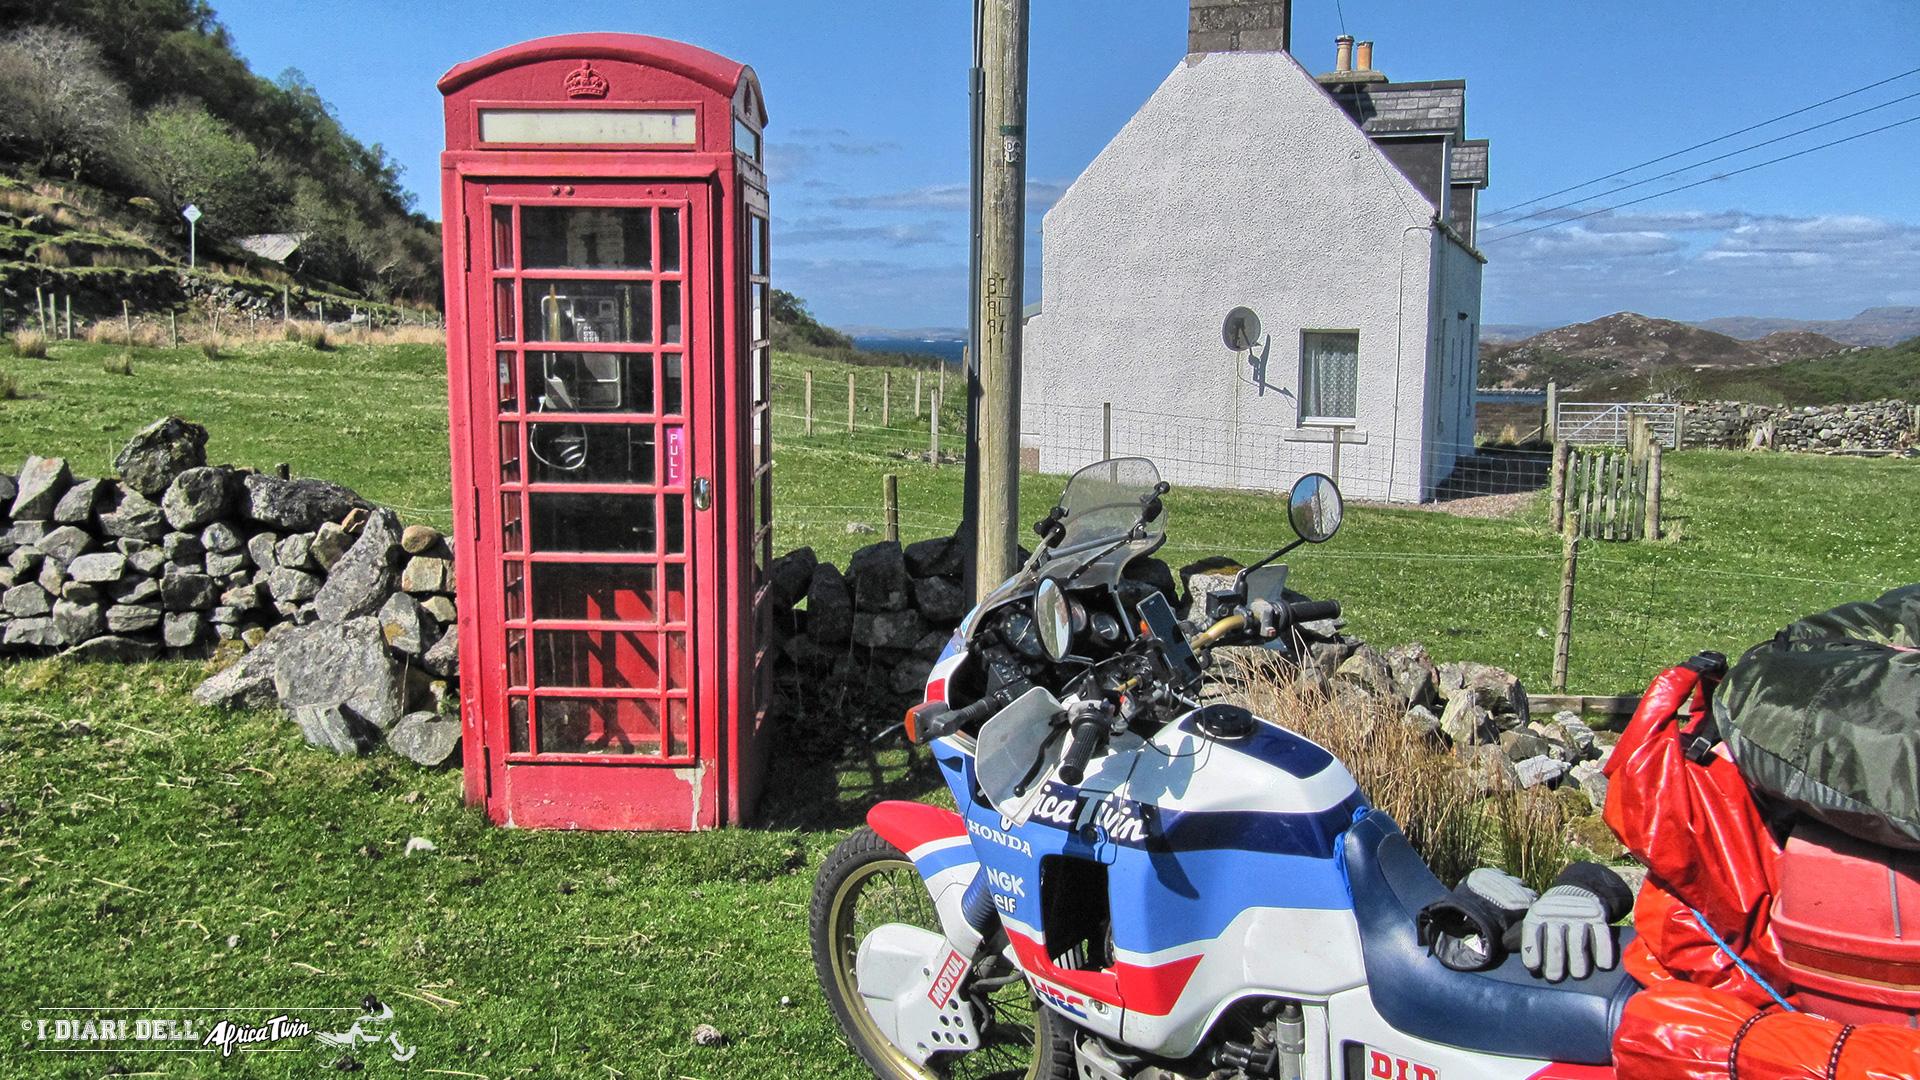 Cabina telefonica inglese in mezzo al nulla